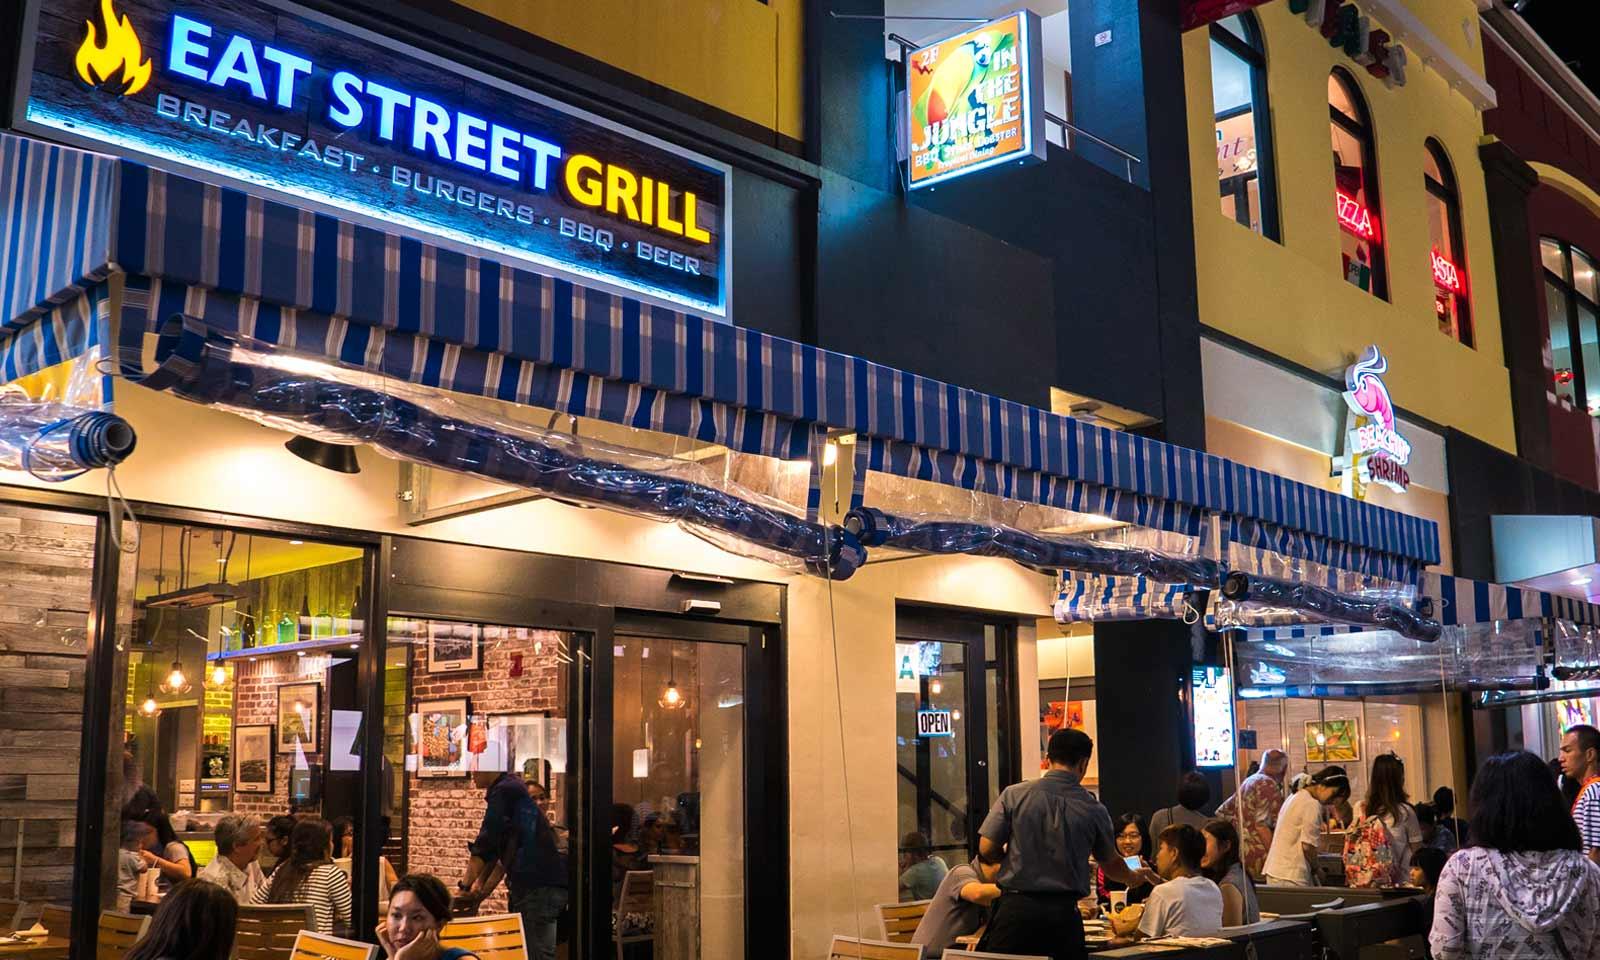 Eat Street Grill in Tumon, Guam